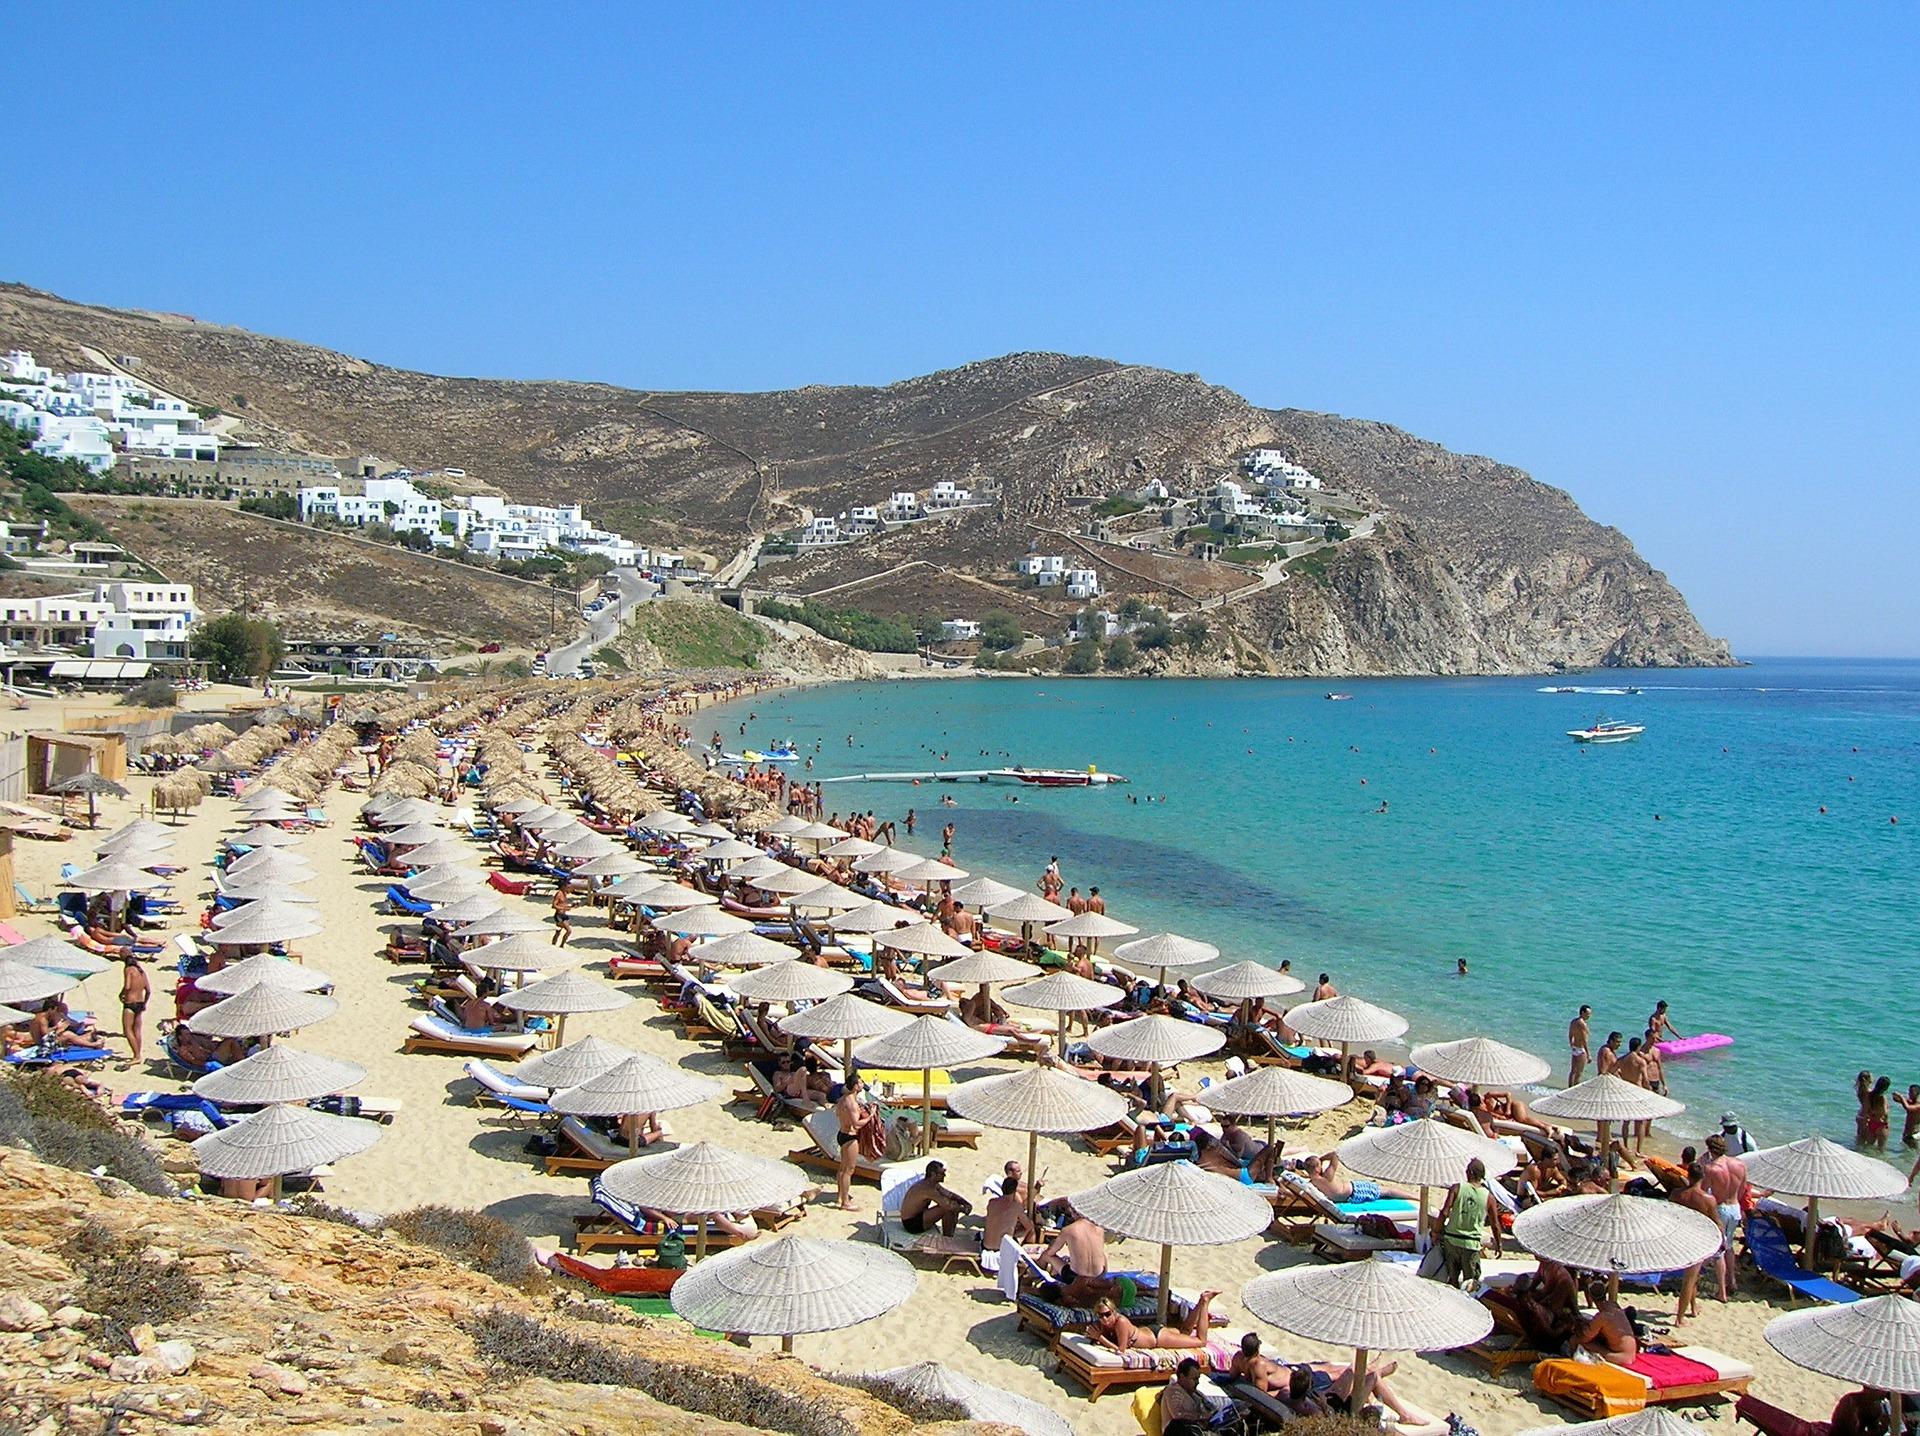 grčka, evropa, drzava, turizam, turisti, letovanje